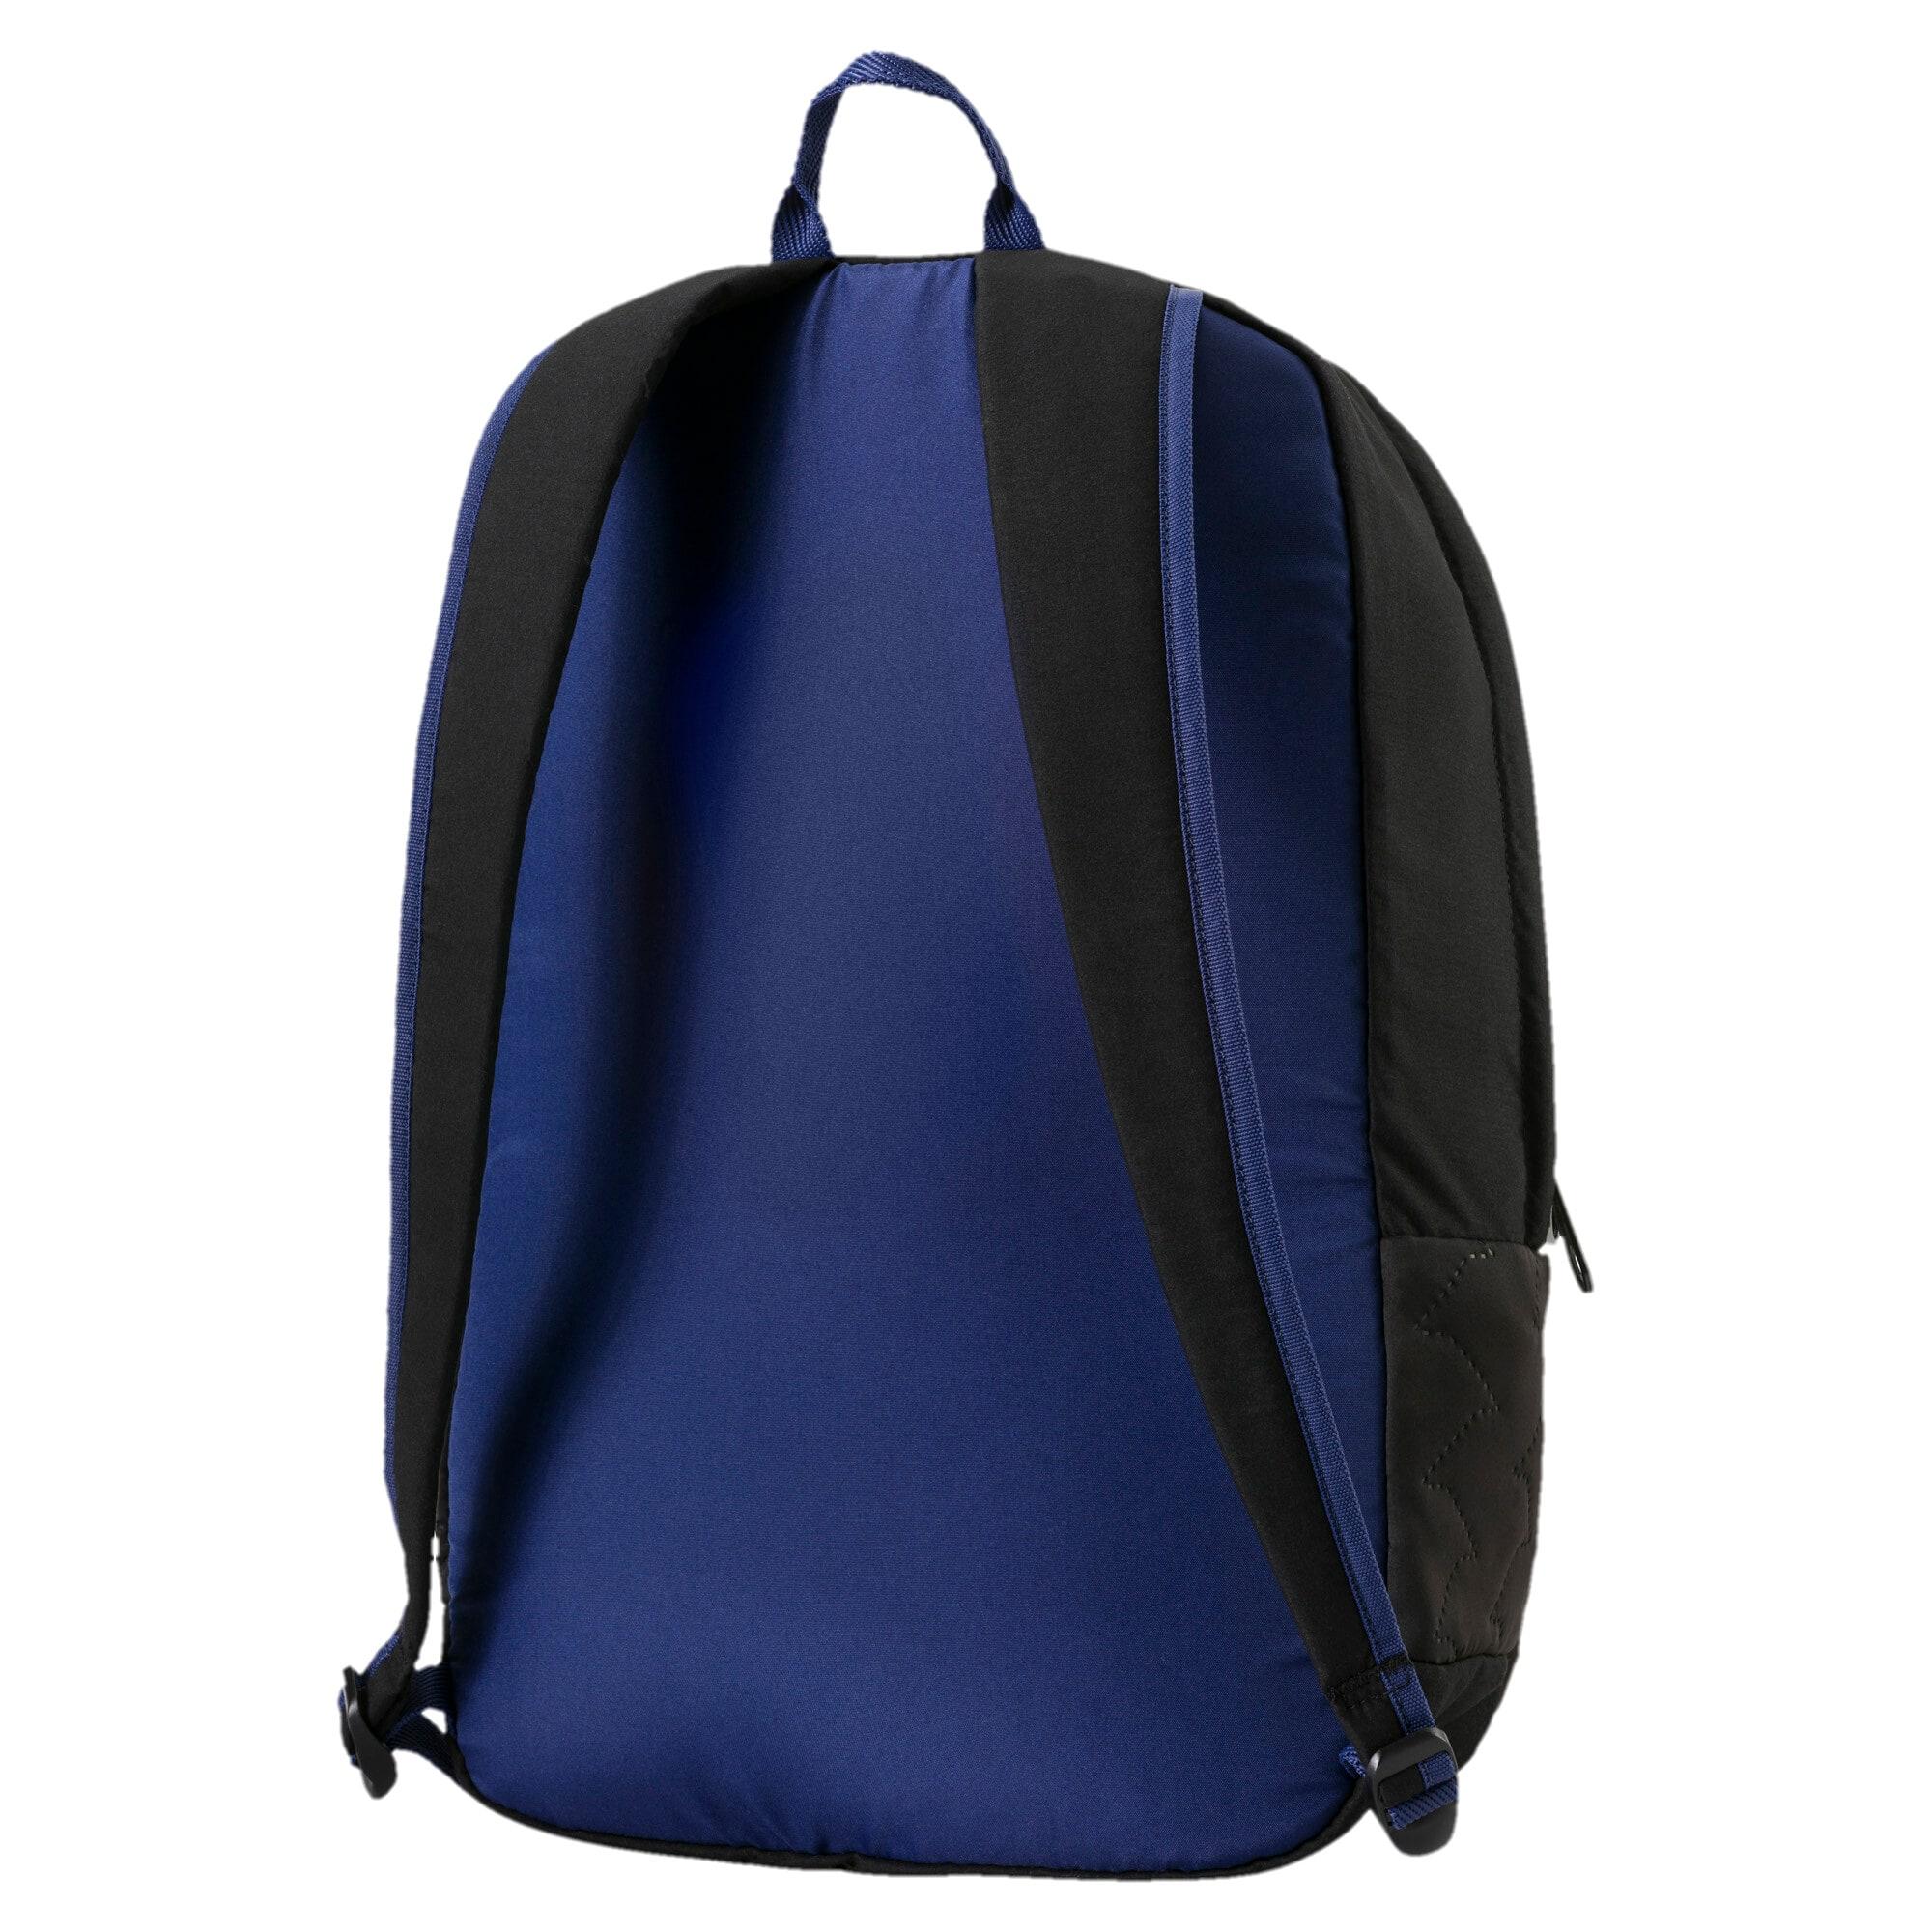 Thumbnail 2 of Women's Prime Lux Backpack, Puma Black-Blue Depths, medium-IND